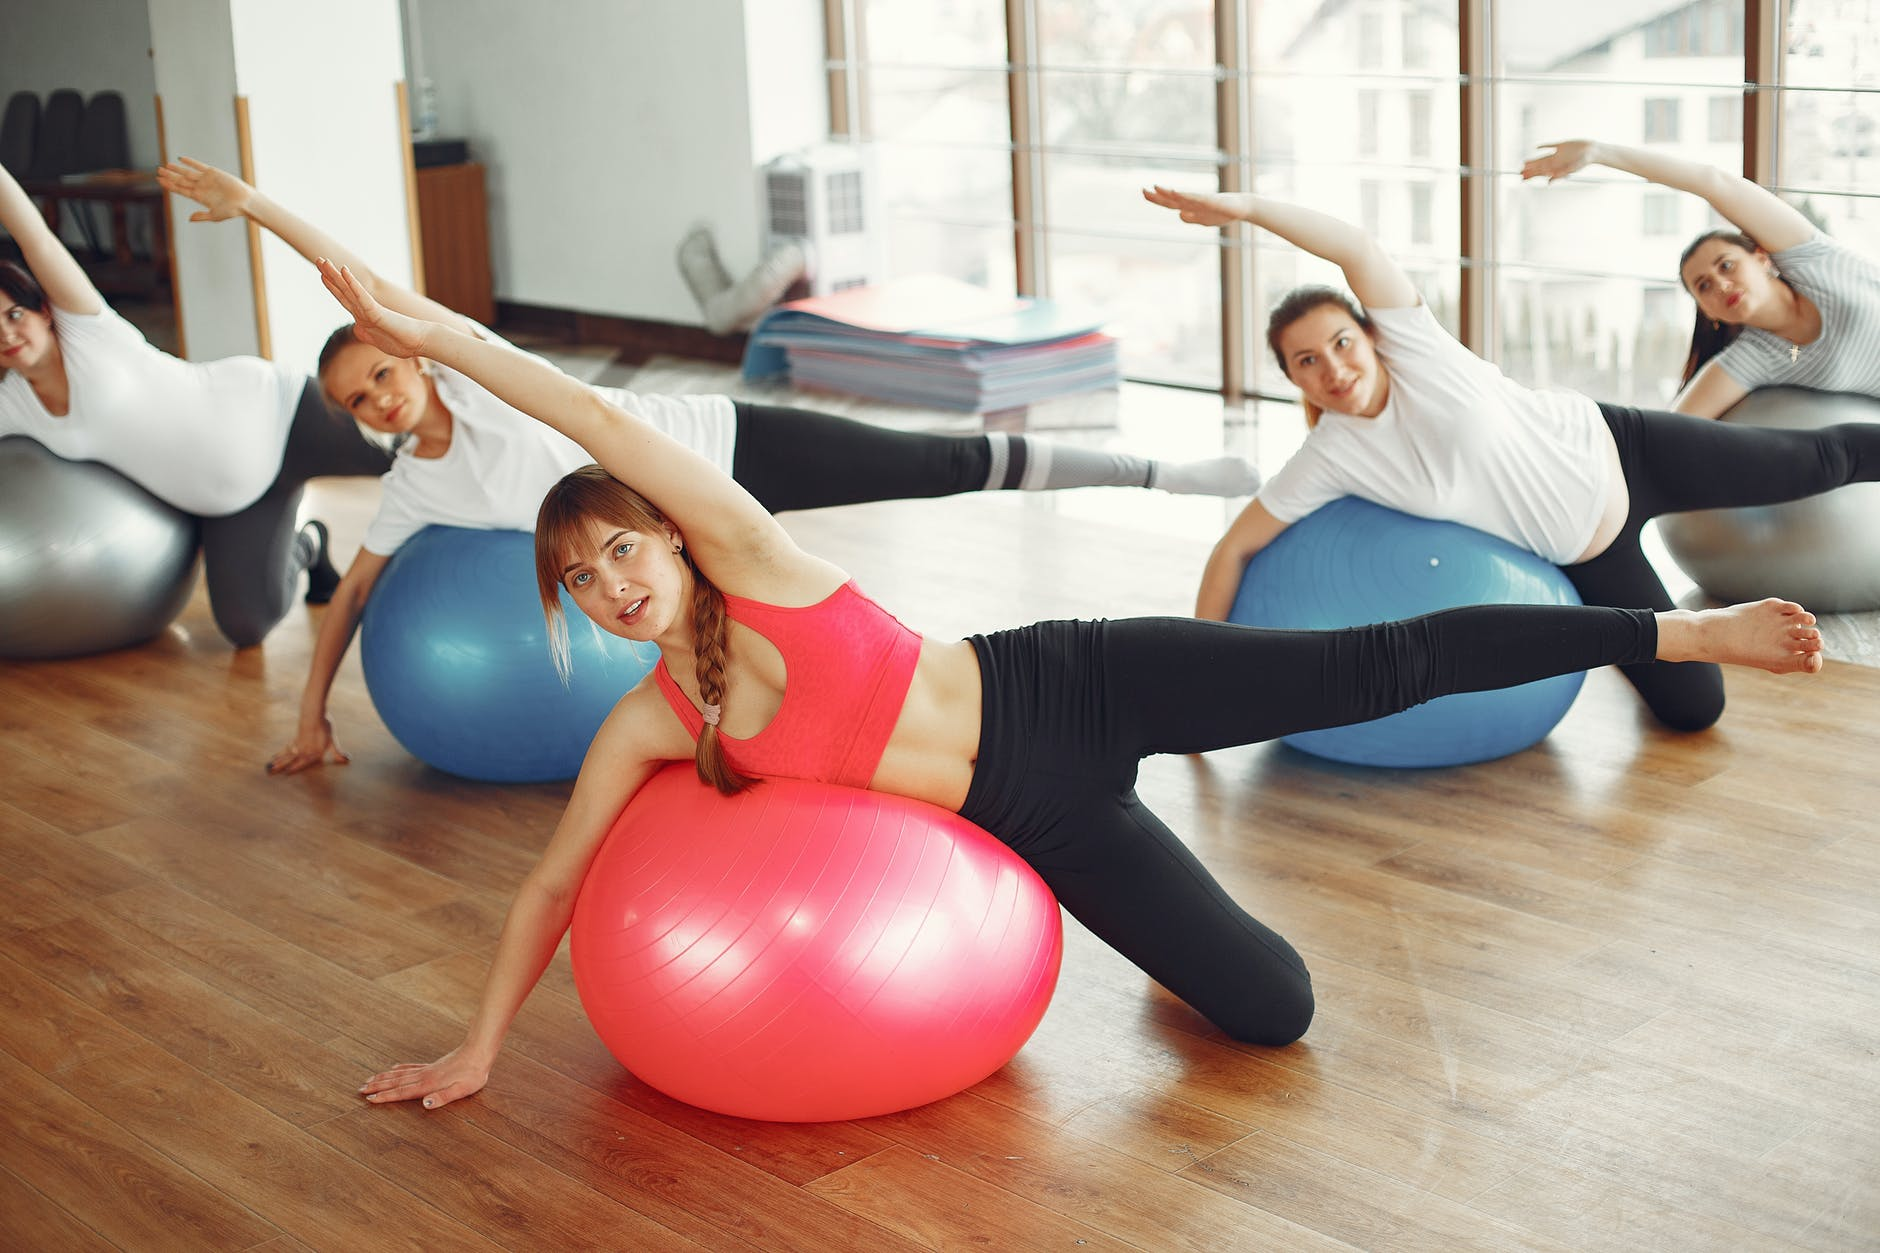 gymball image